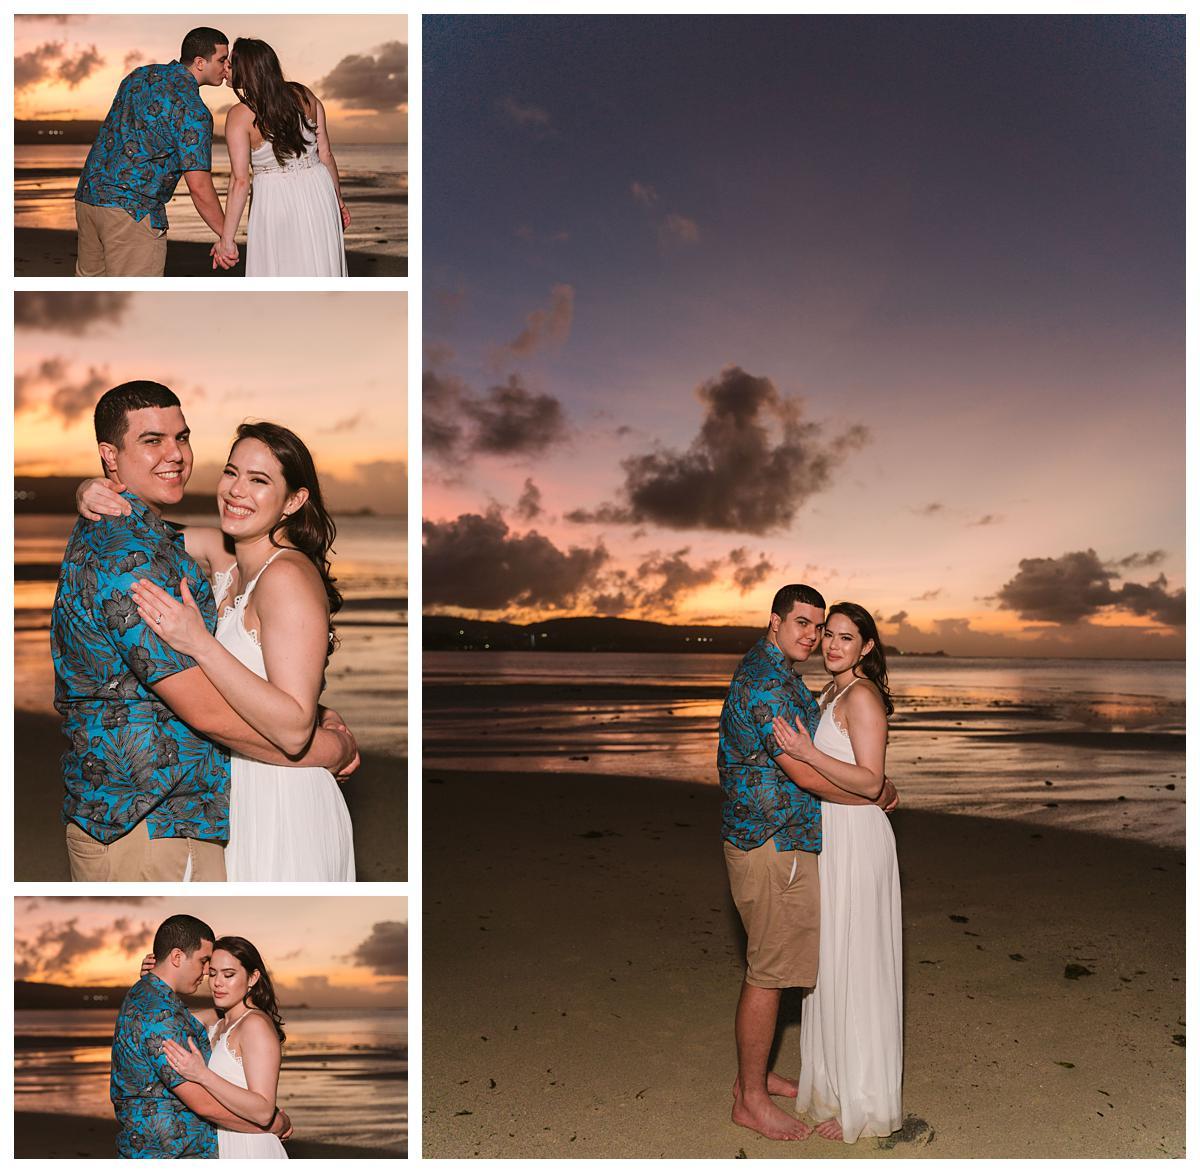 21PX_Guam_Photographers_Engagement Session_0025.jpg